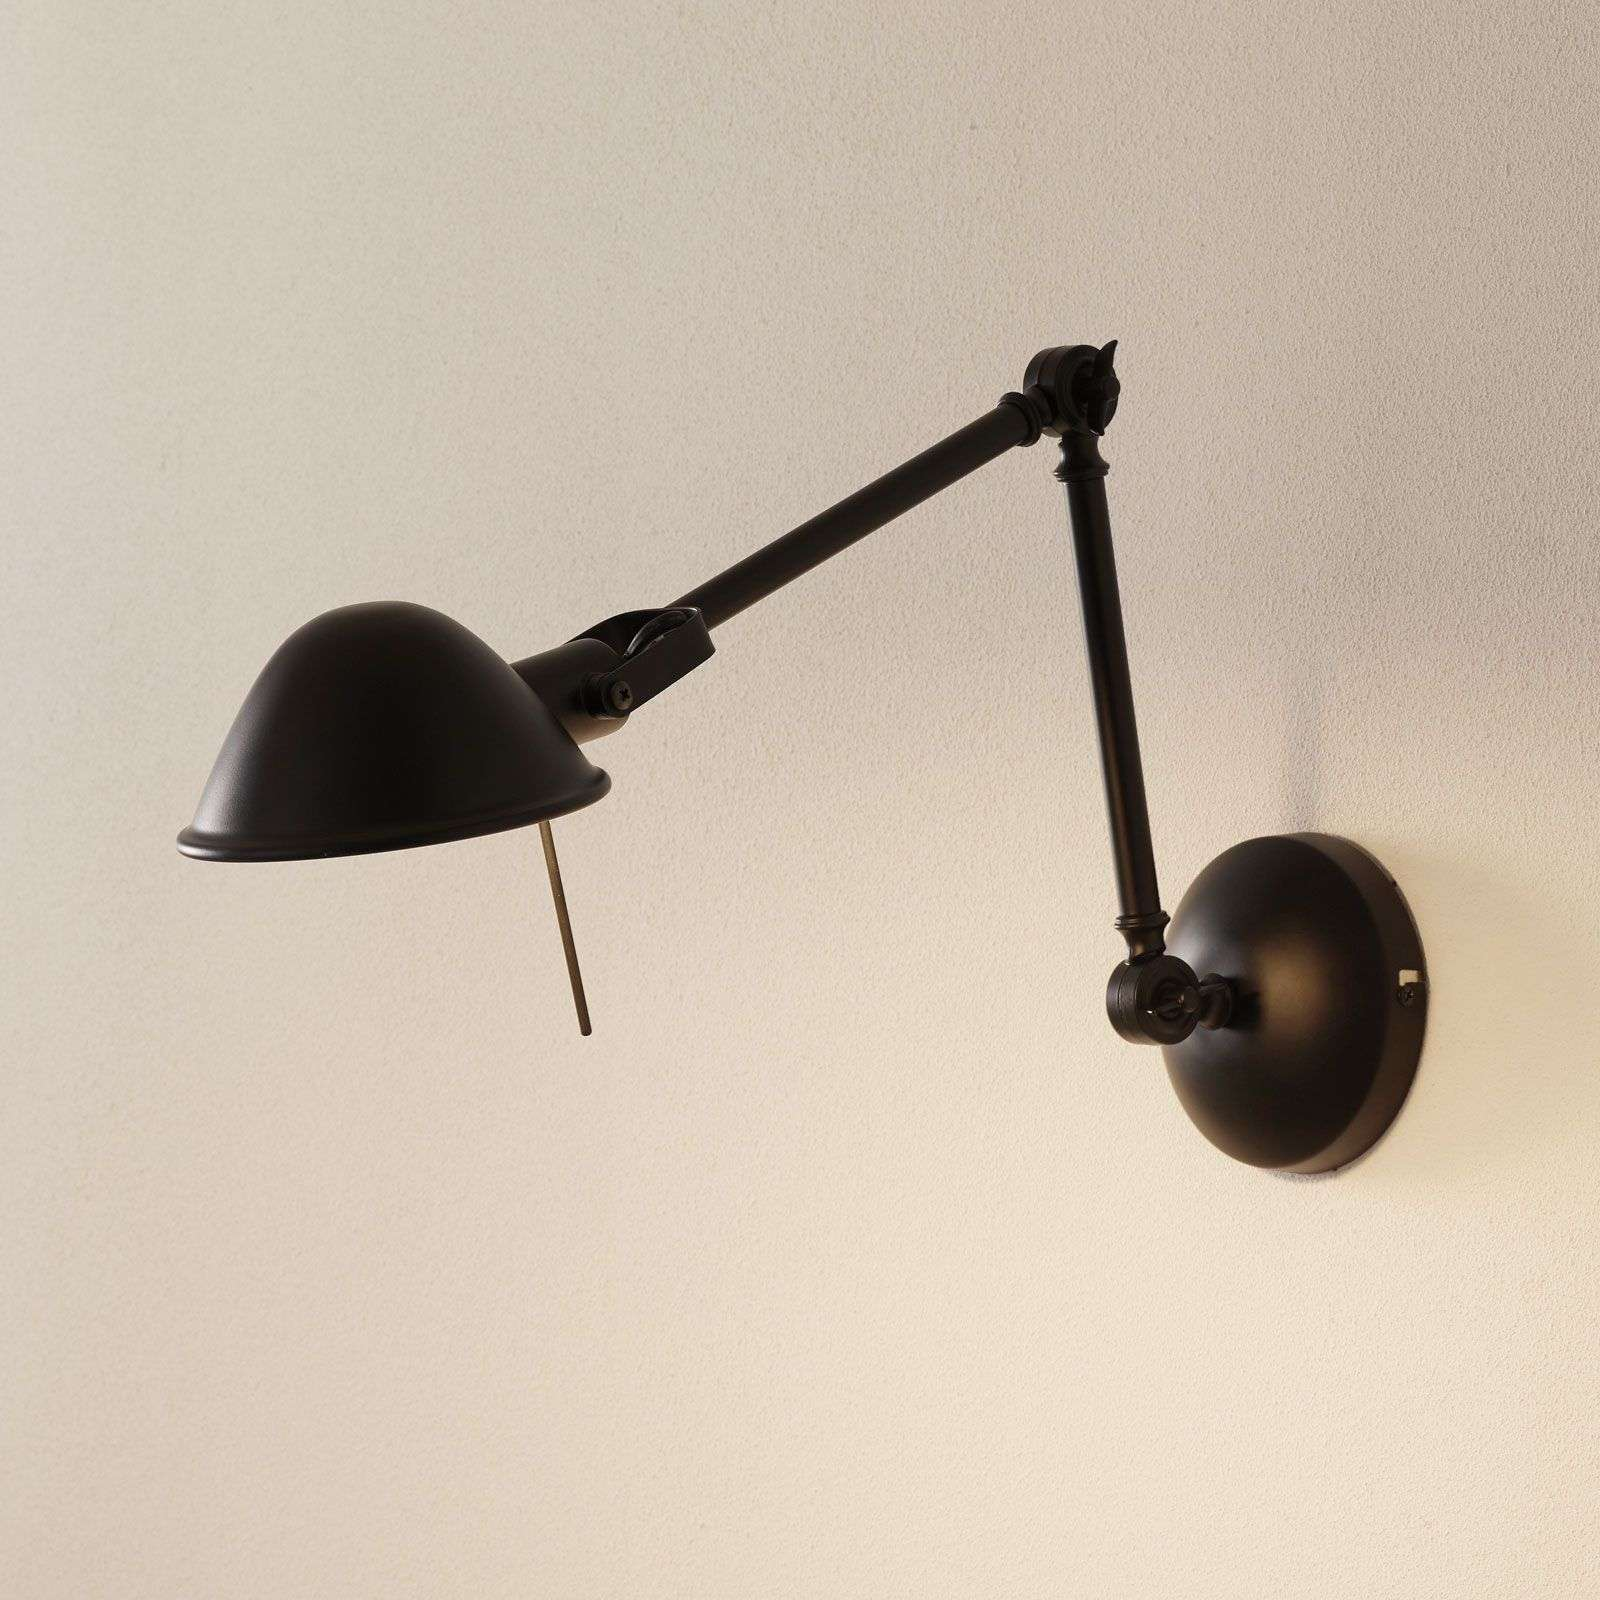 Flexible wall light torana in black lights flexible wall light torana in black 1509066 31 mozeypictures Choice Image